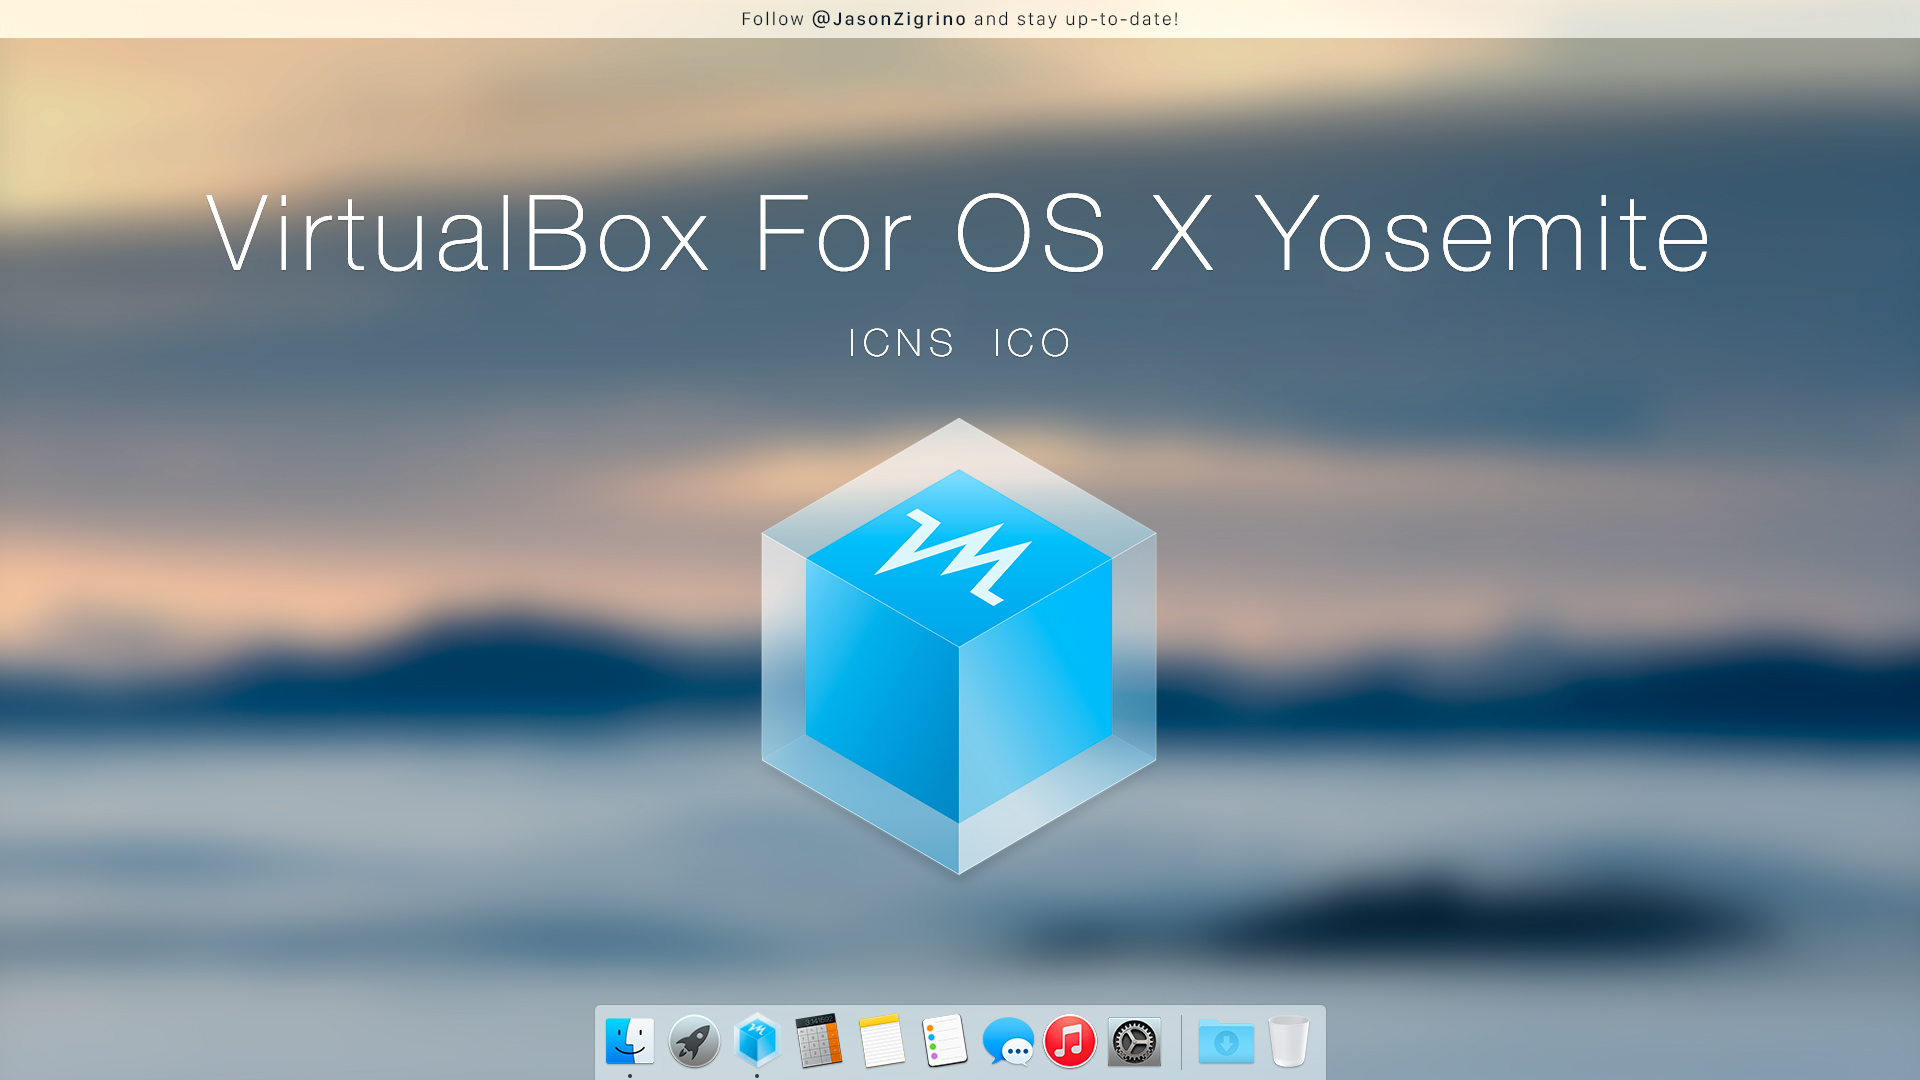 VirtualBox For OS X Yosemite by JasonZigrino